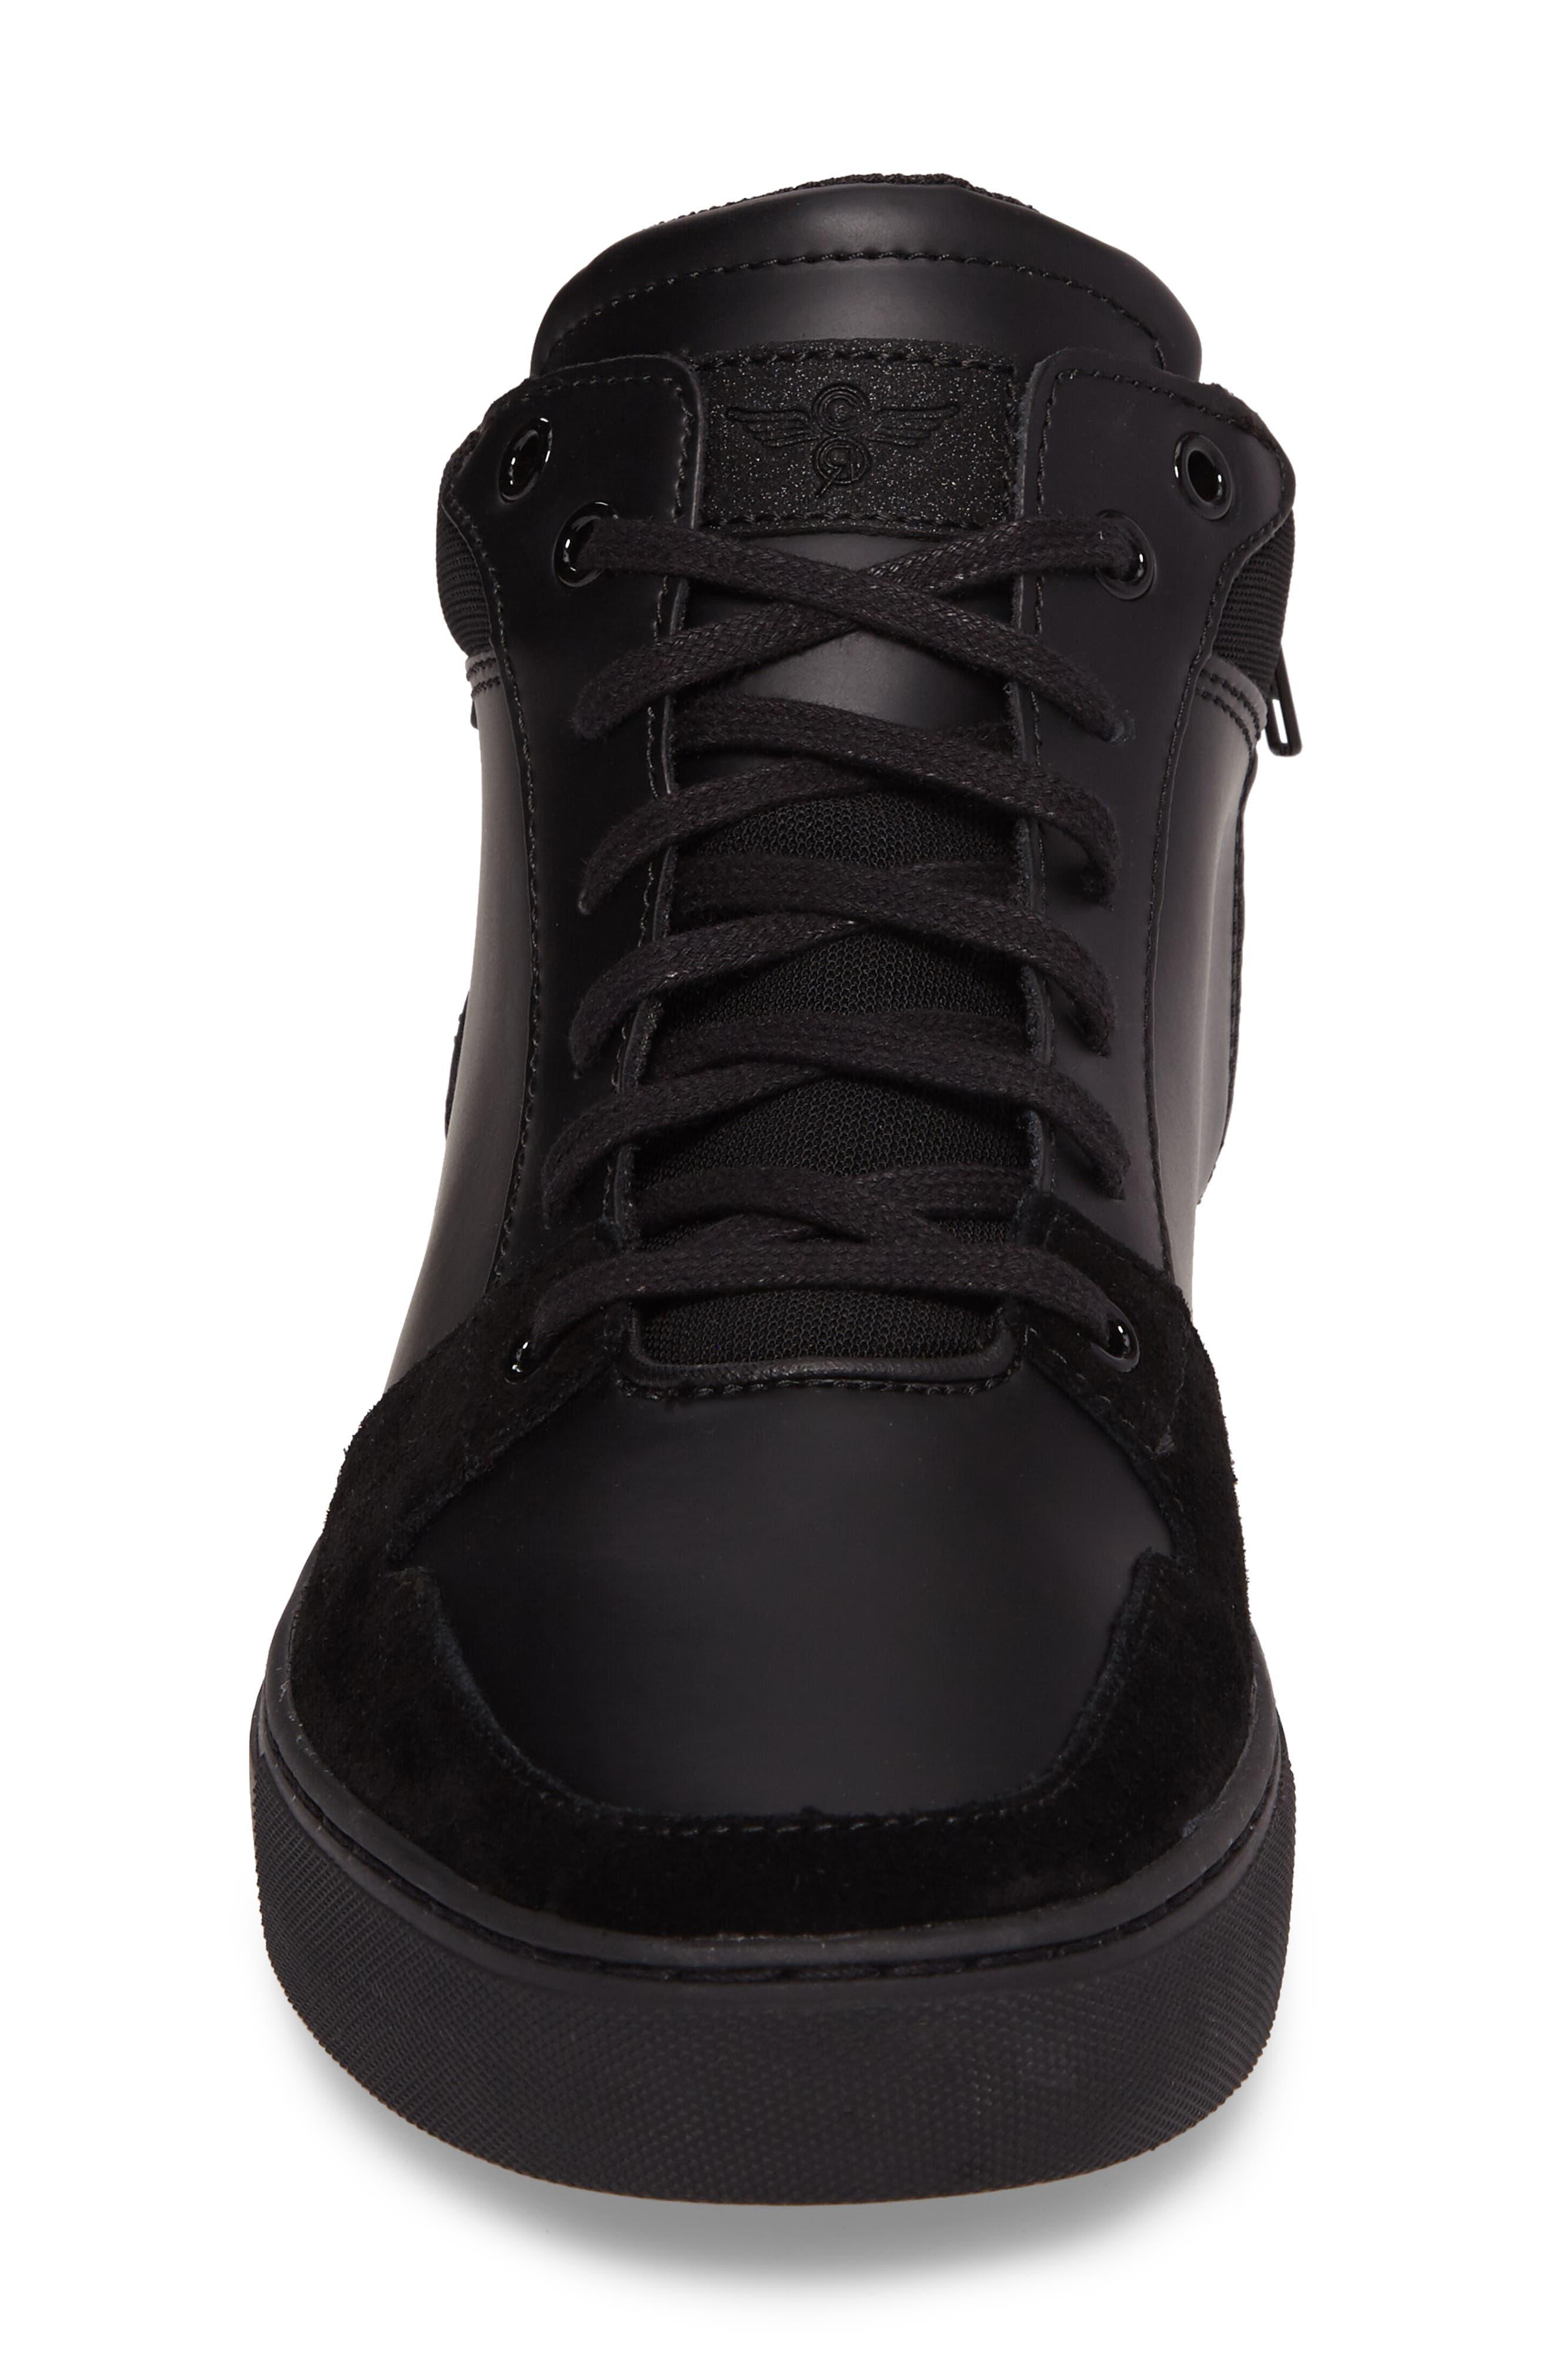 Modena Sneaker,                             Alternate thumbnail 4, color,                             001